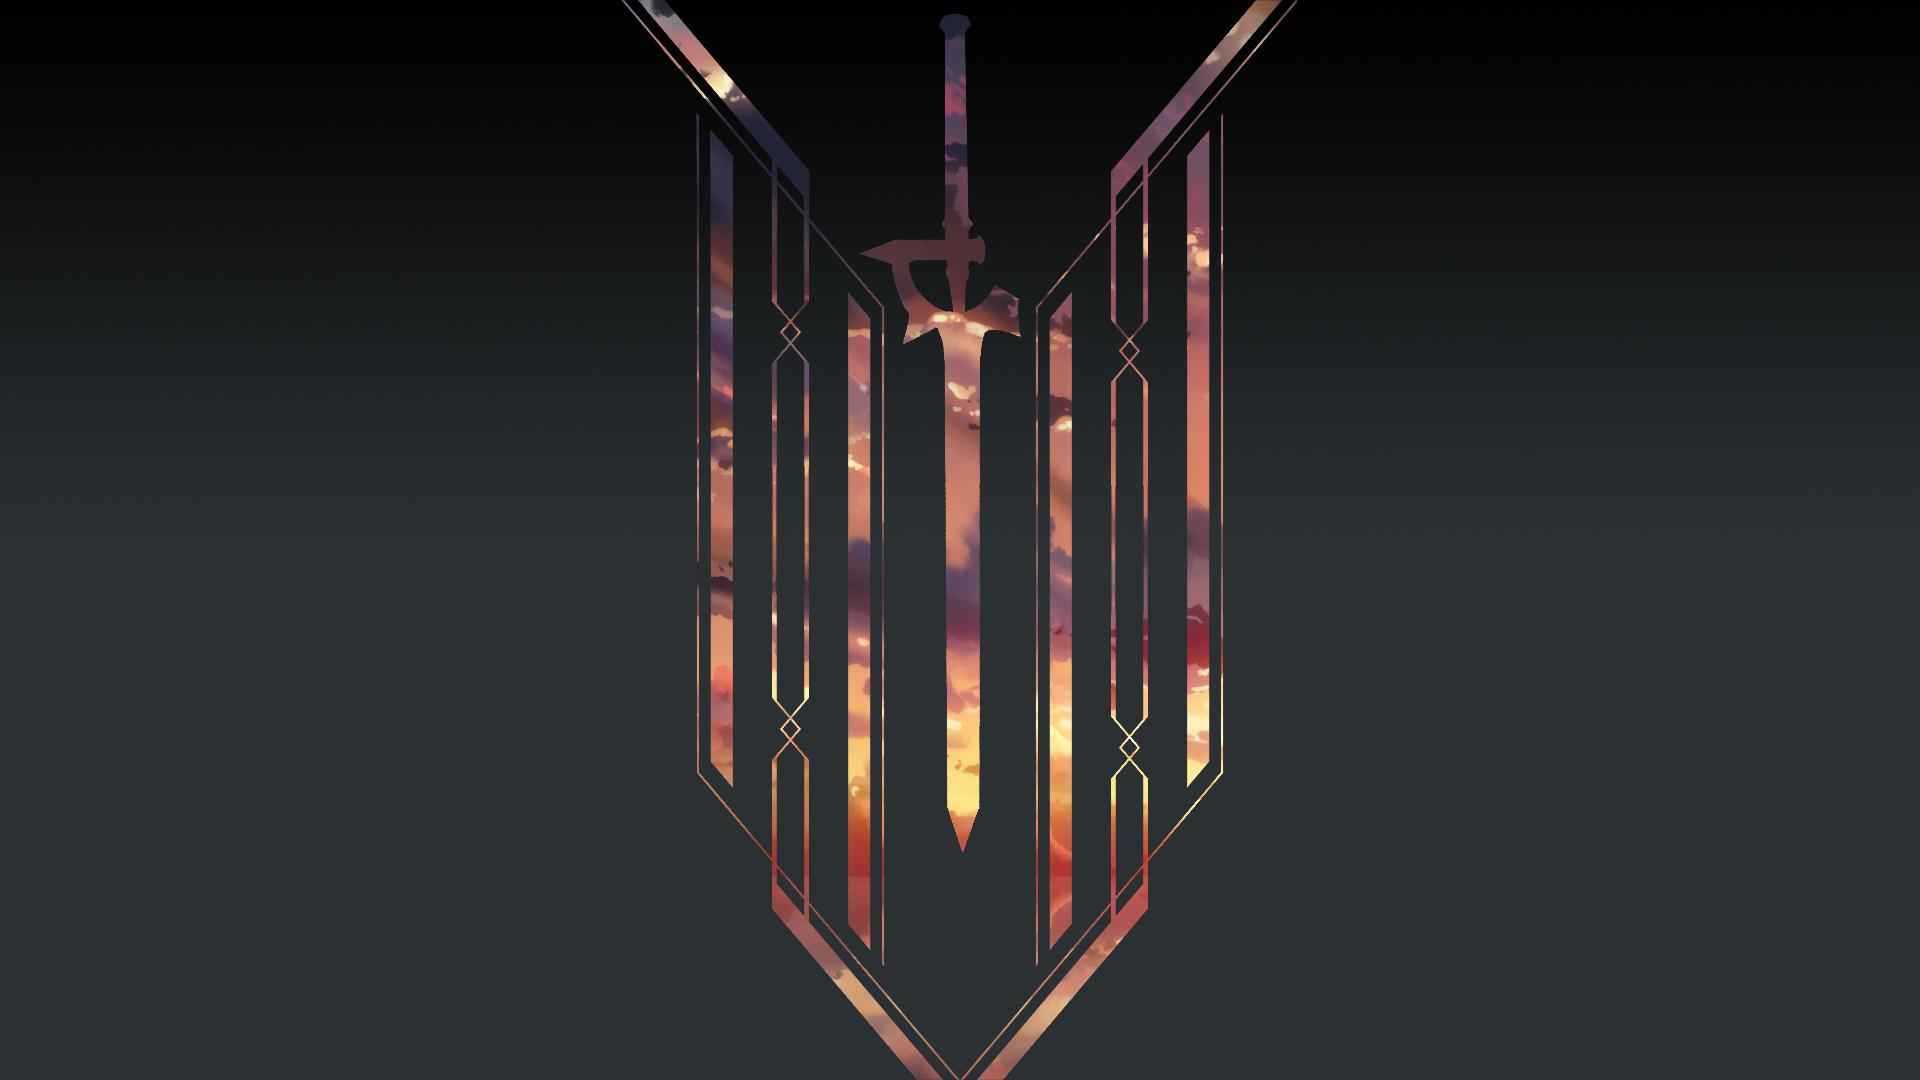 Wallpaper Sword Art Online Sword Kirigaya Kazuto Kirito Sword